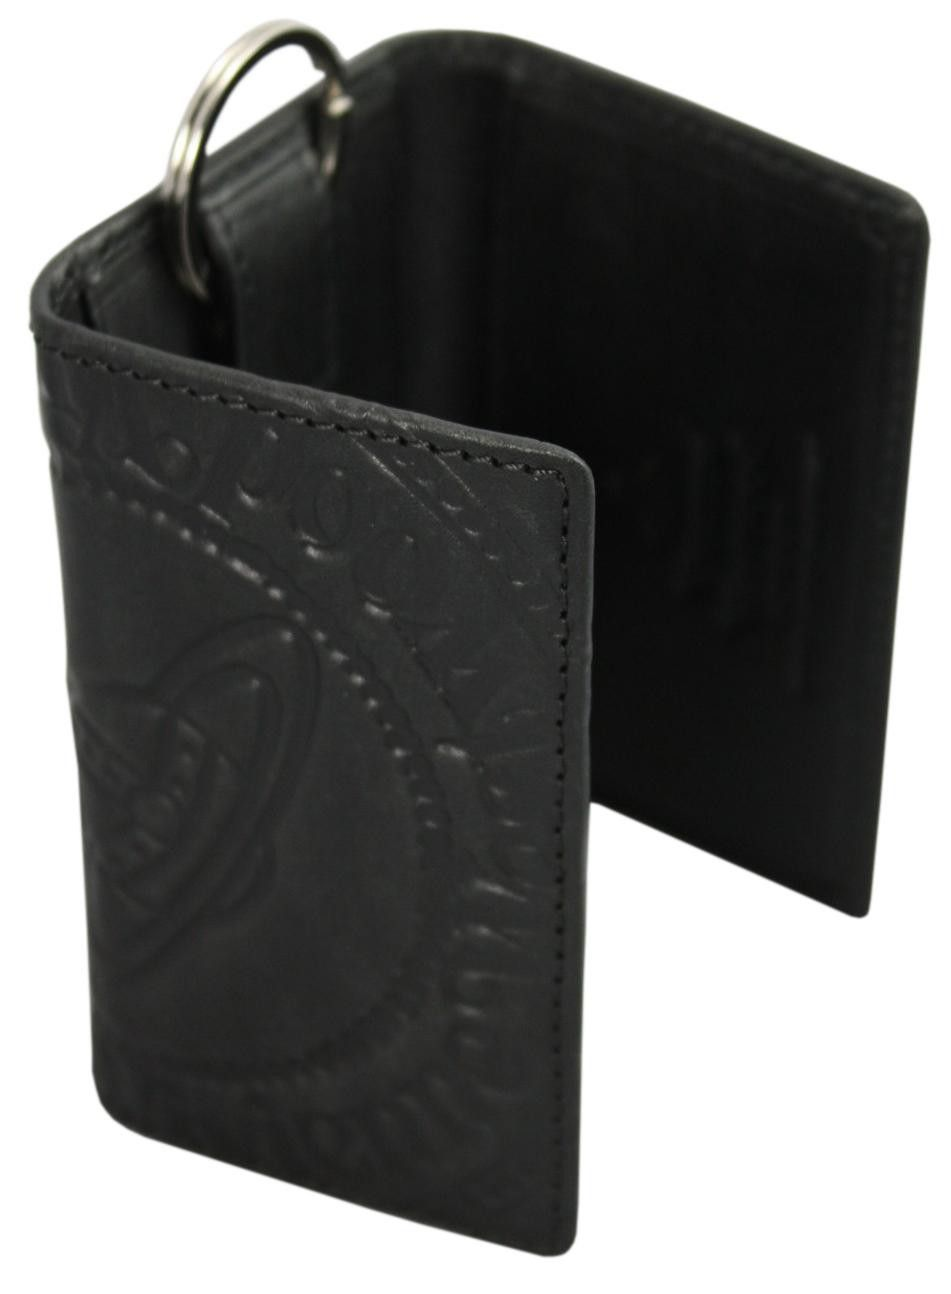 470bd2f085e Vivienne Westwood Wallet - Black Key Wallet  Mens  Wallet